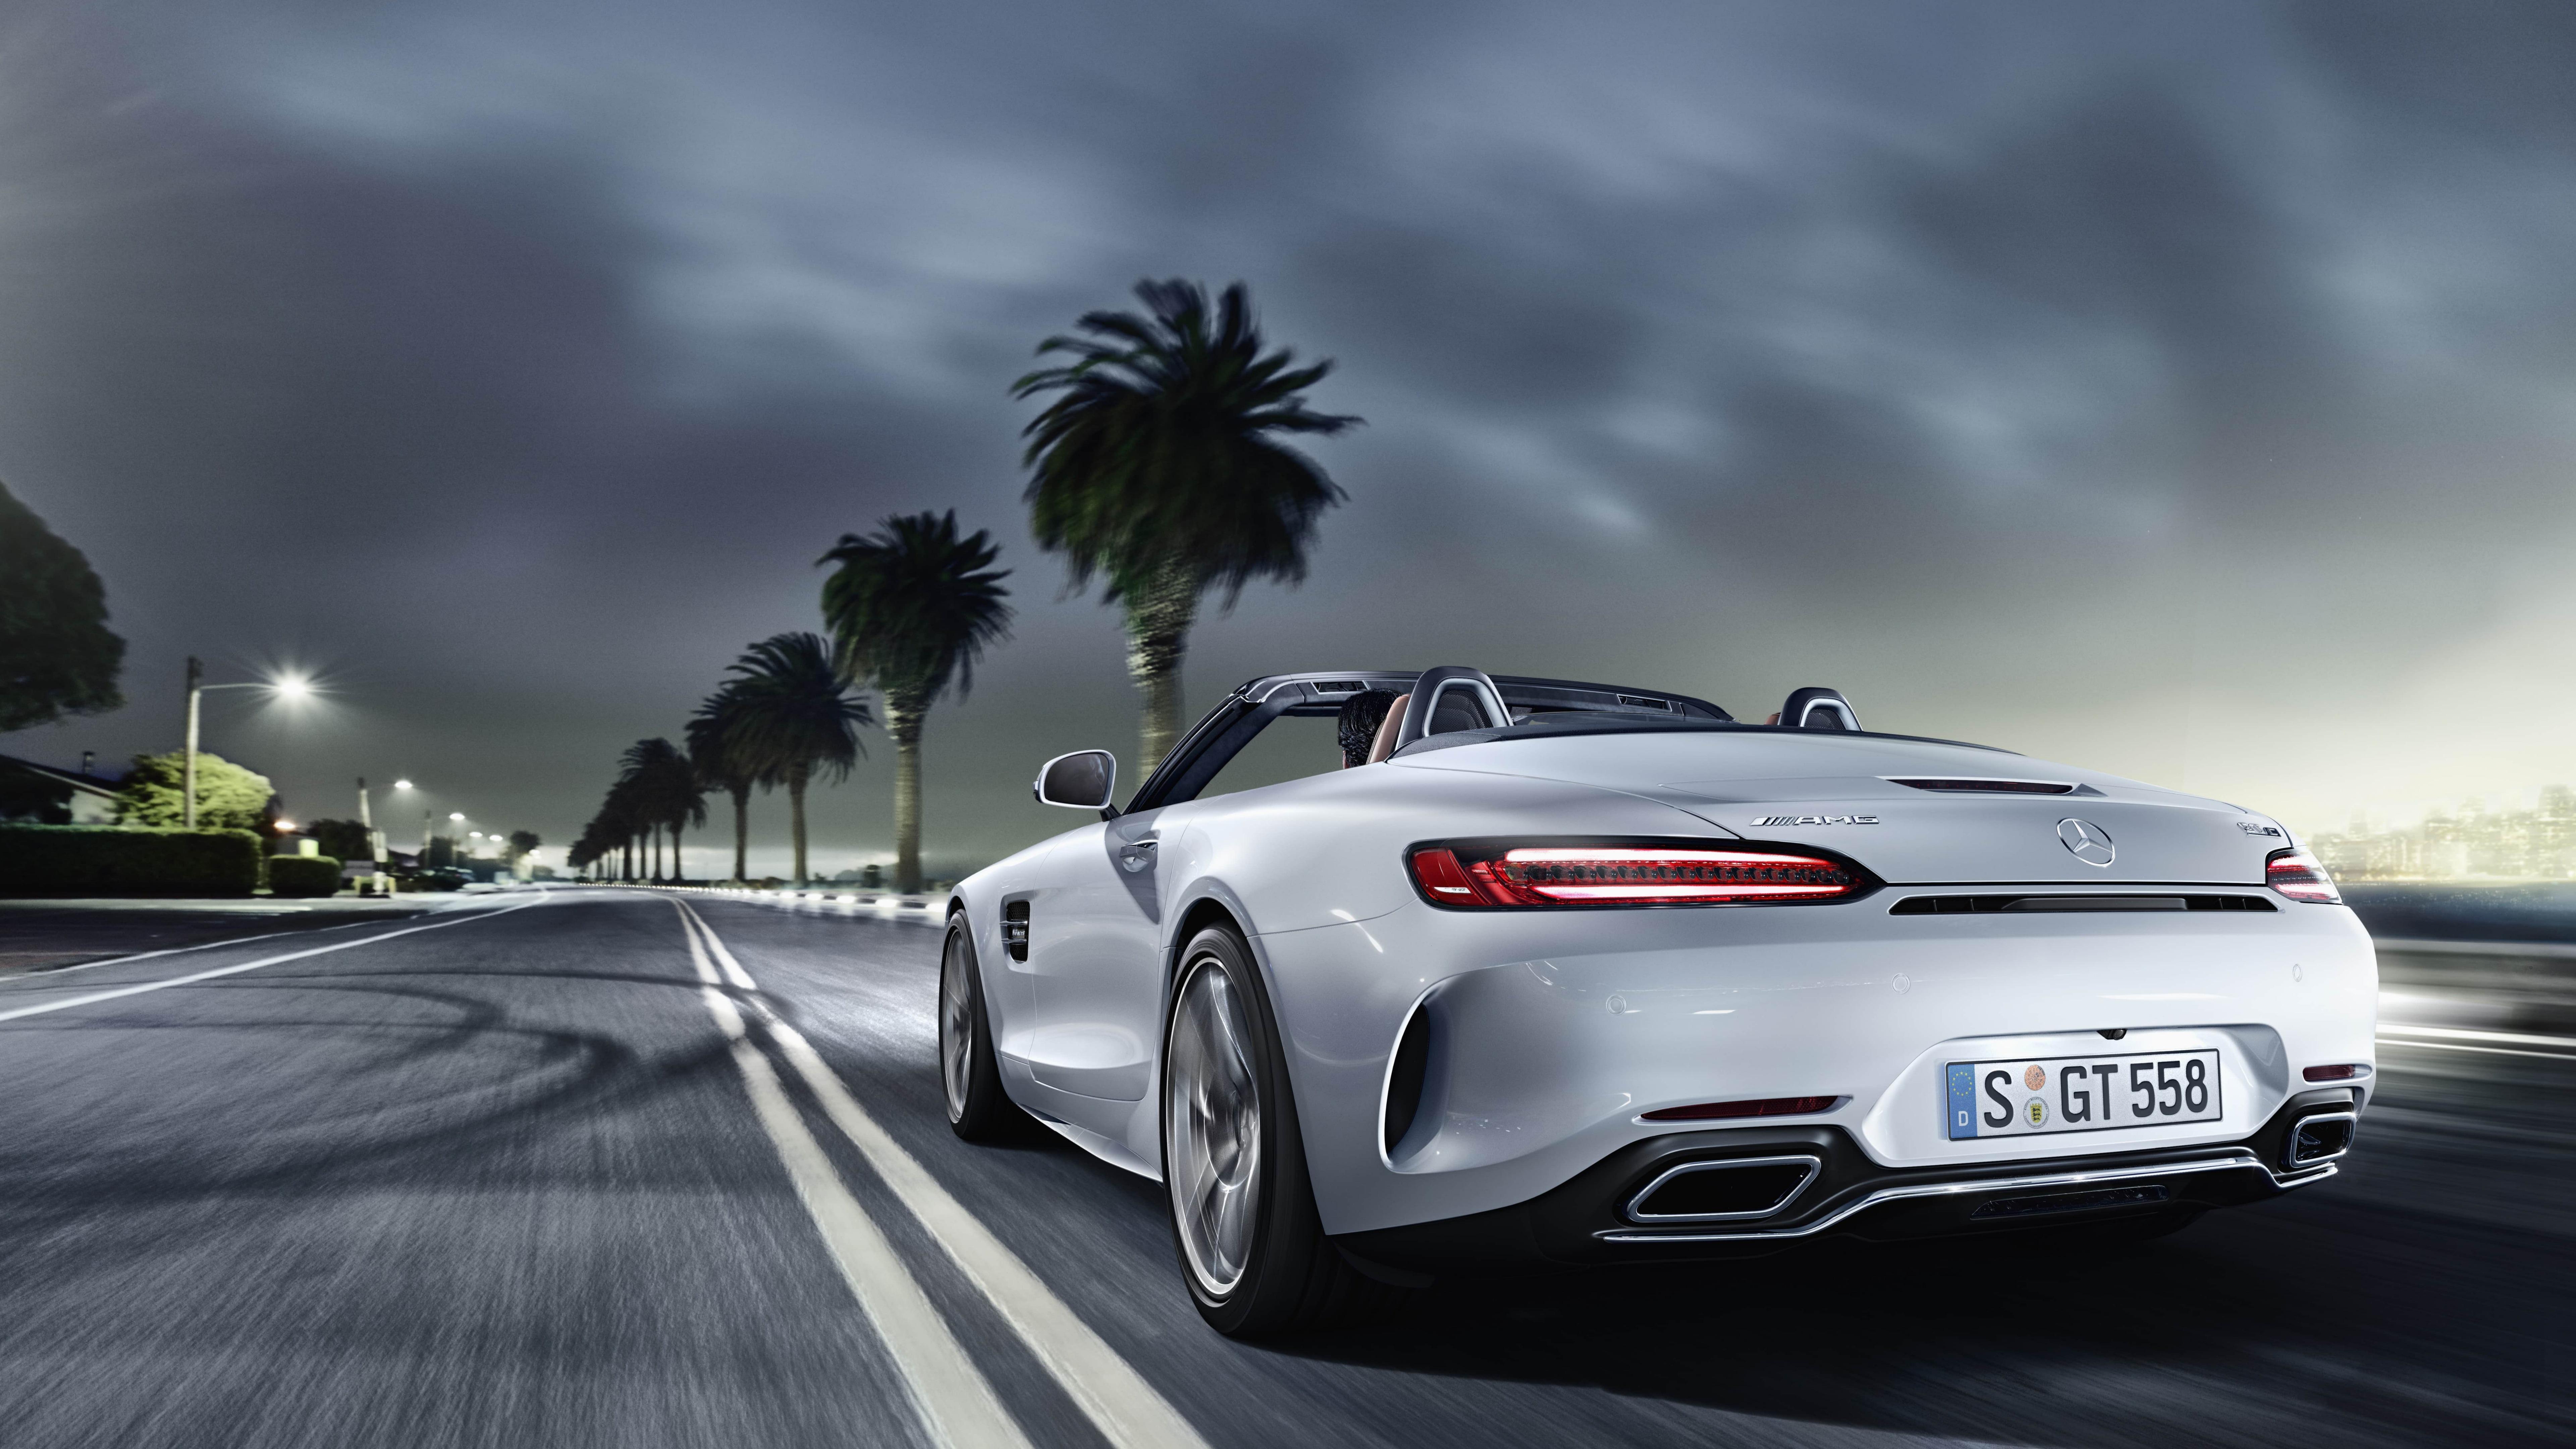 Mercedes AMG GT-C Roadster wallpaper